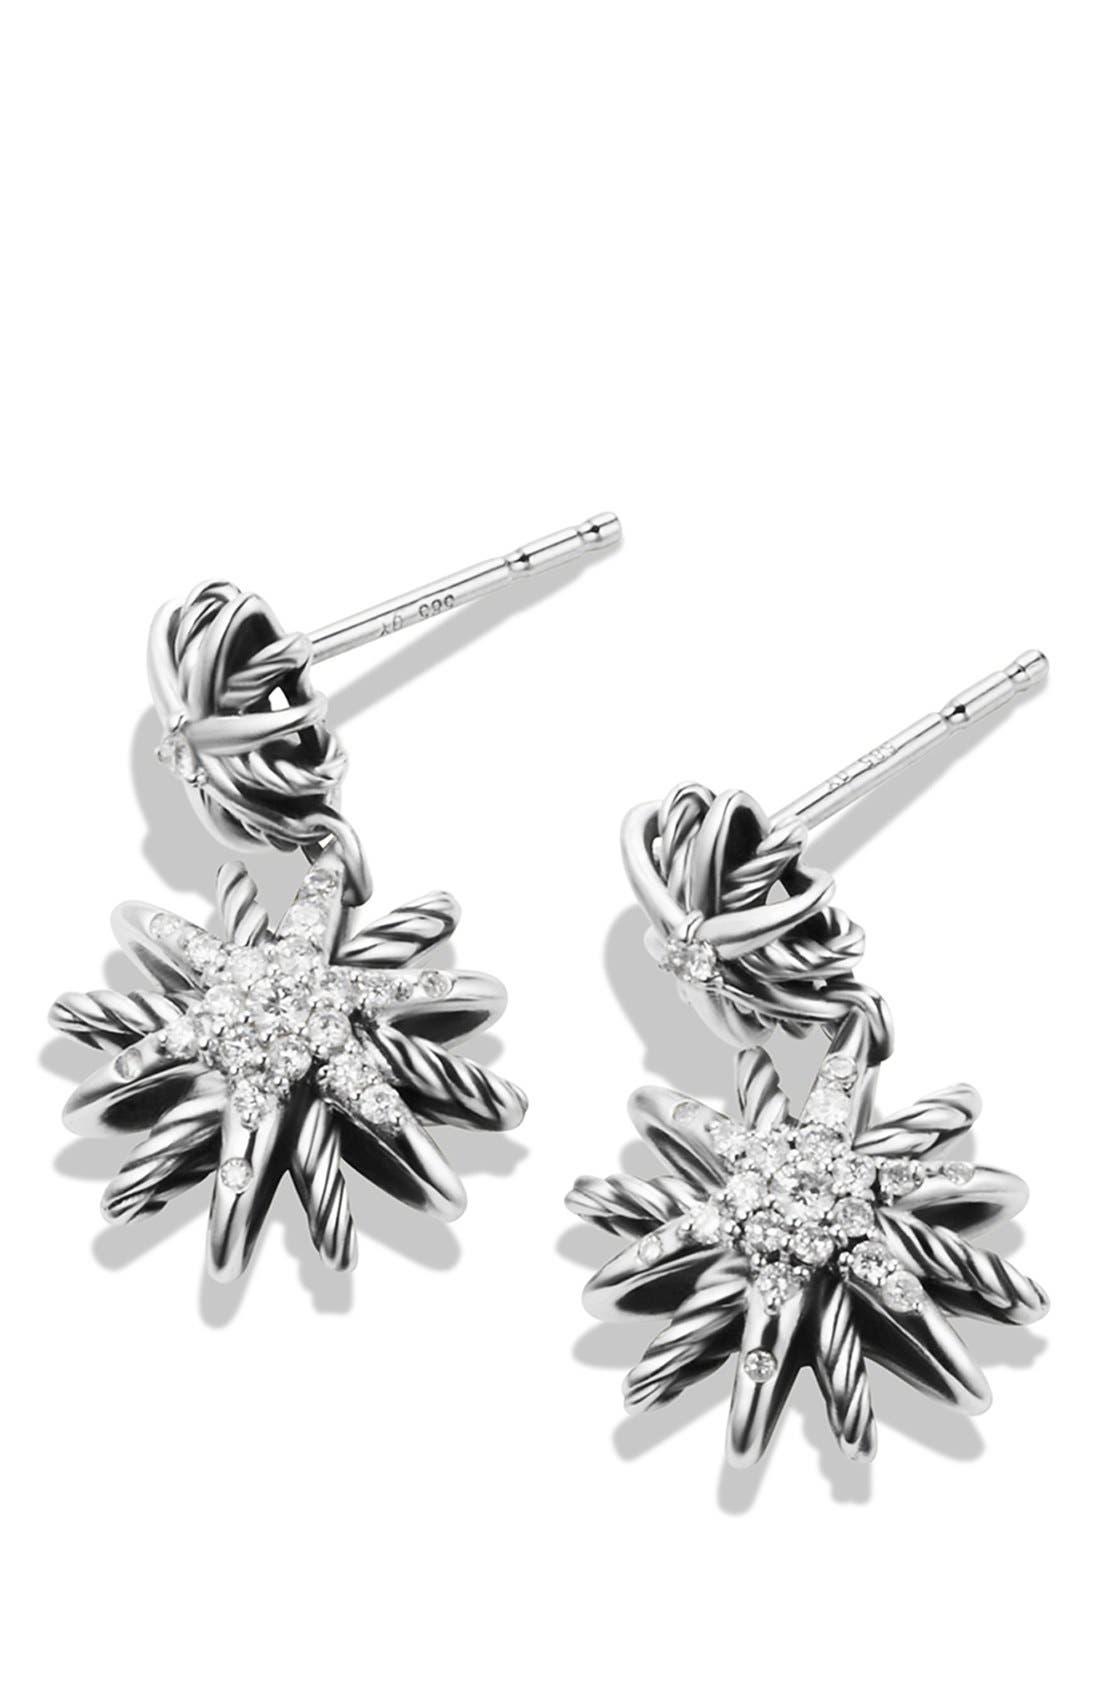 DAVID YURMAN, 'Starburst' Double-Drop Earrings with Diamonds, Alternate thumbnail 3, color, DIAMOND